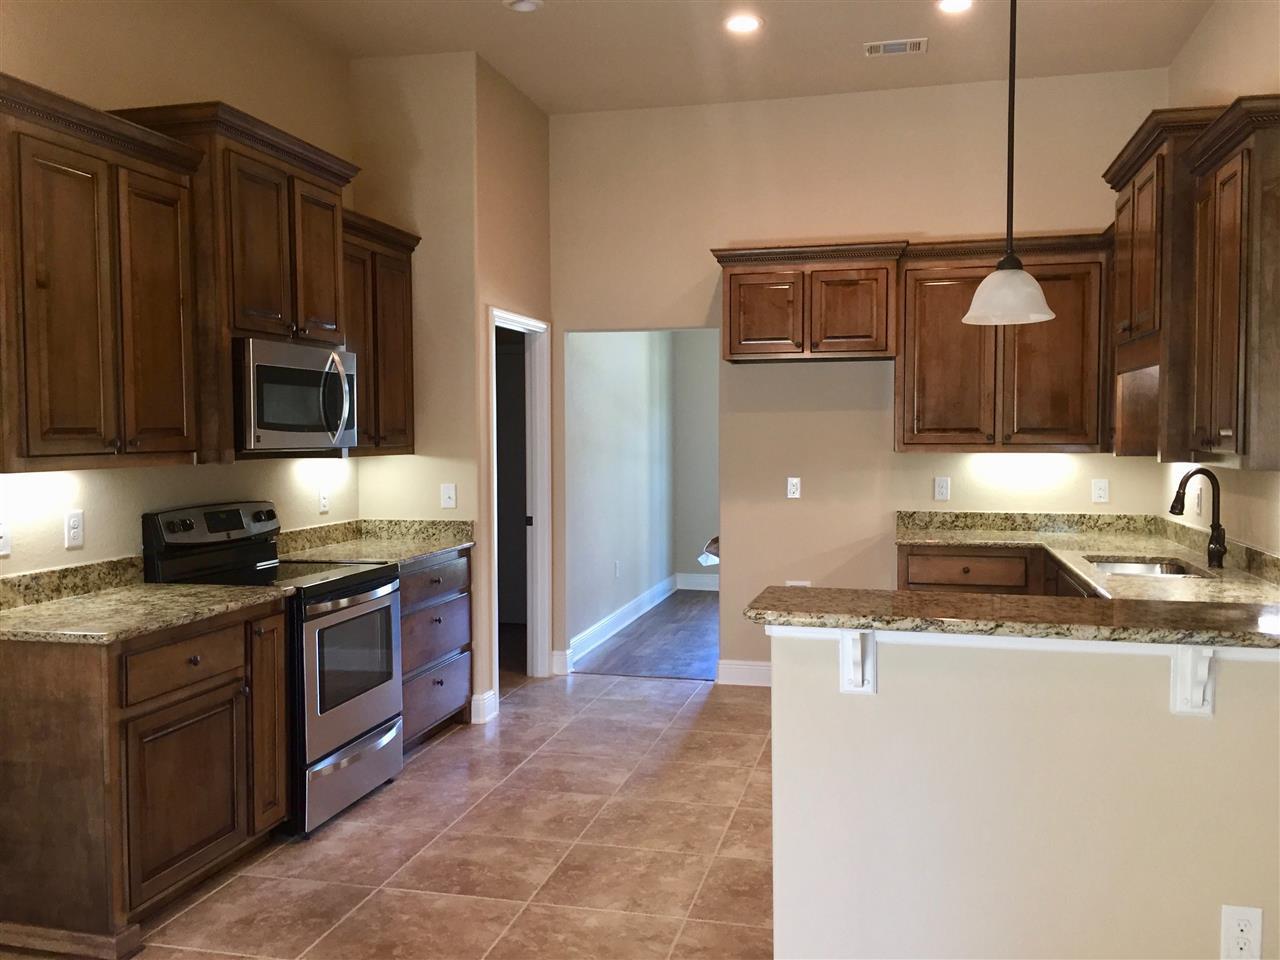 109 Leonine Hollow, Crestview, FL 32536